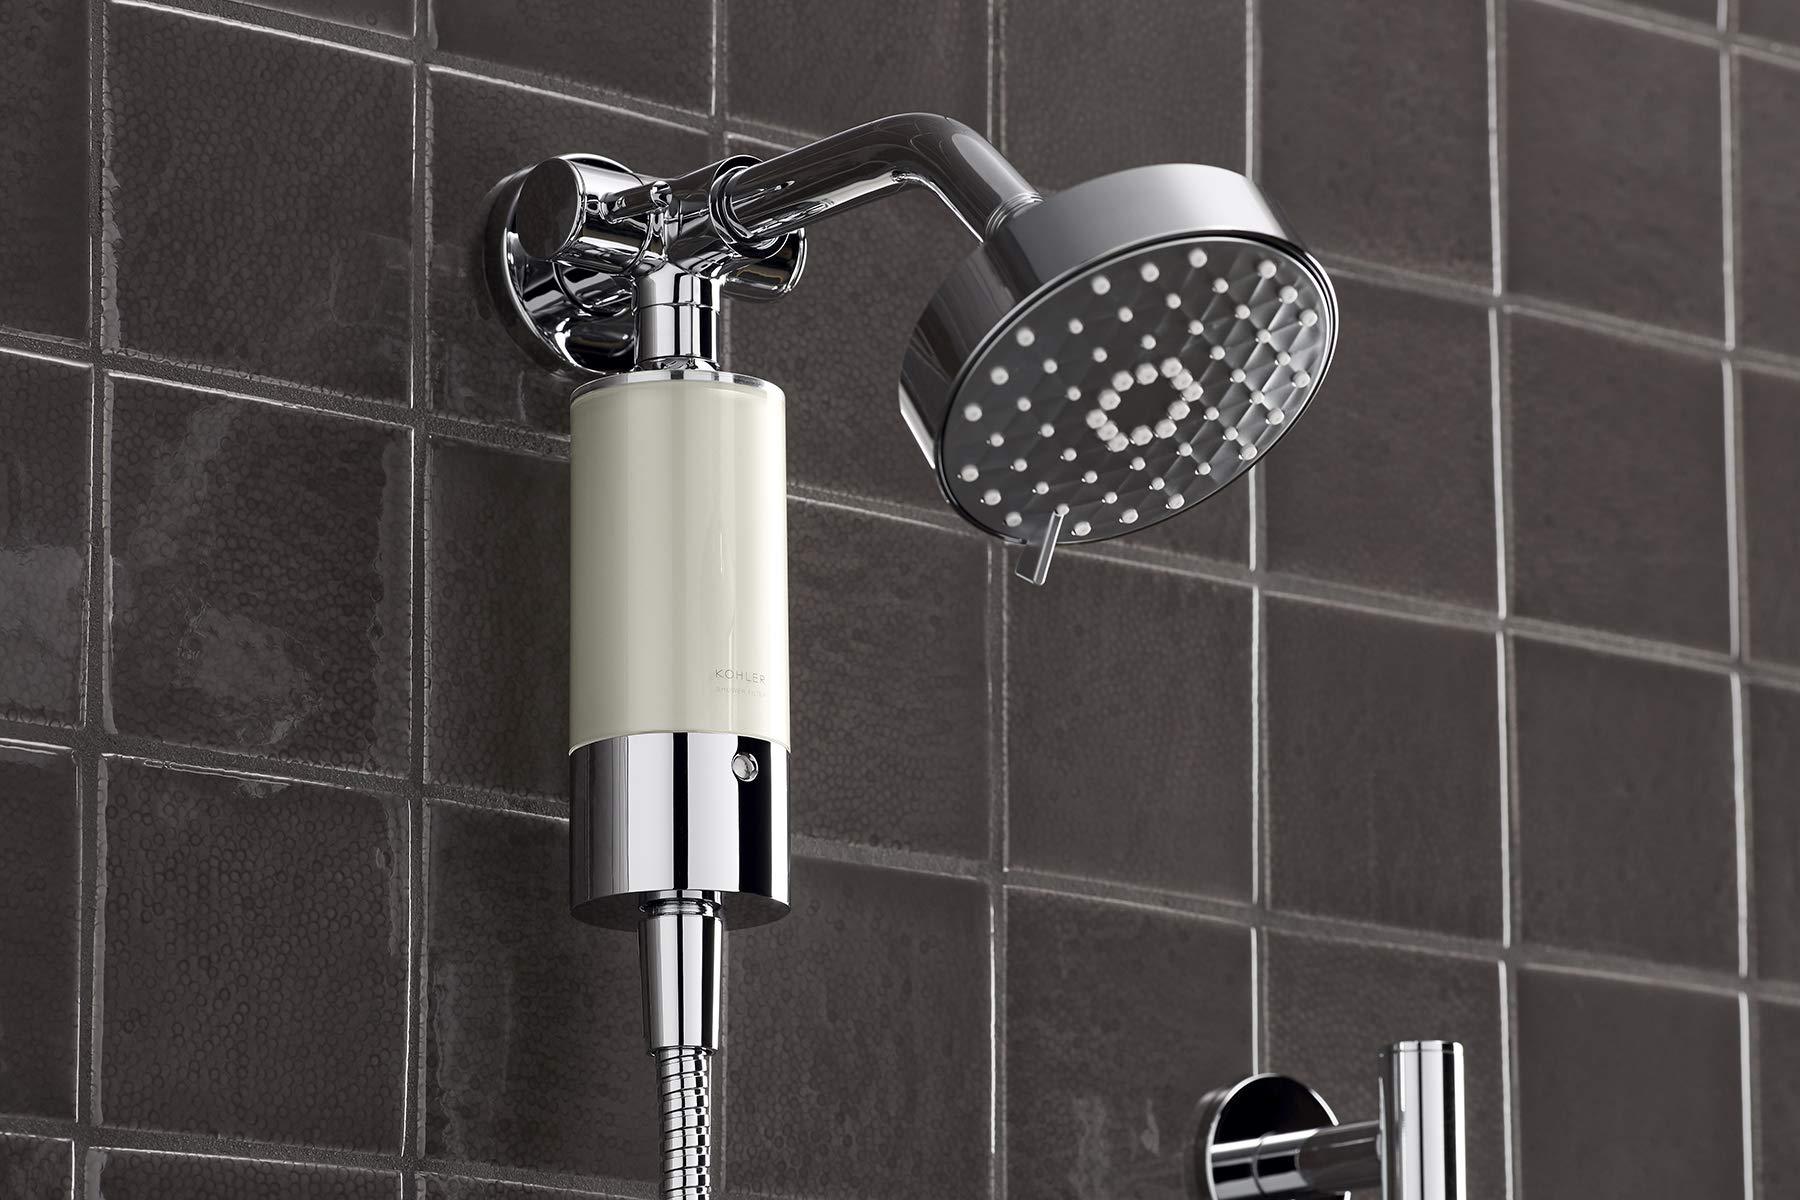 Kohler 30646-CP Aquifer Shower Water Filtration System, Reduce Chlorine and Odor, Includes Filter Replacement by Kohler (Image #5)